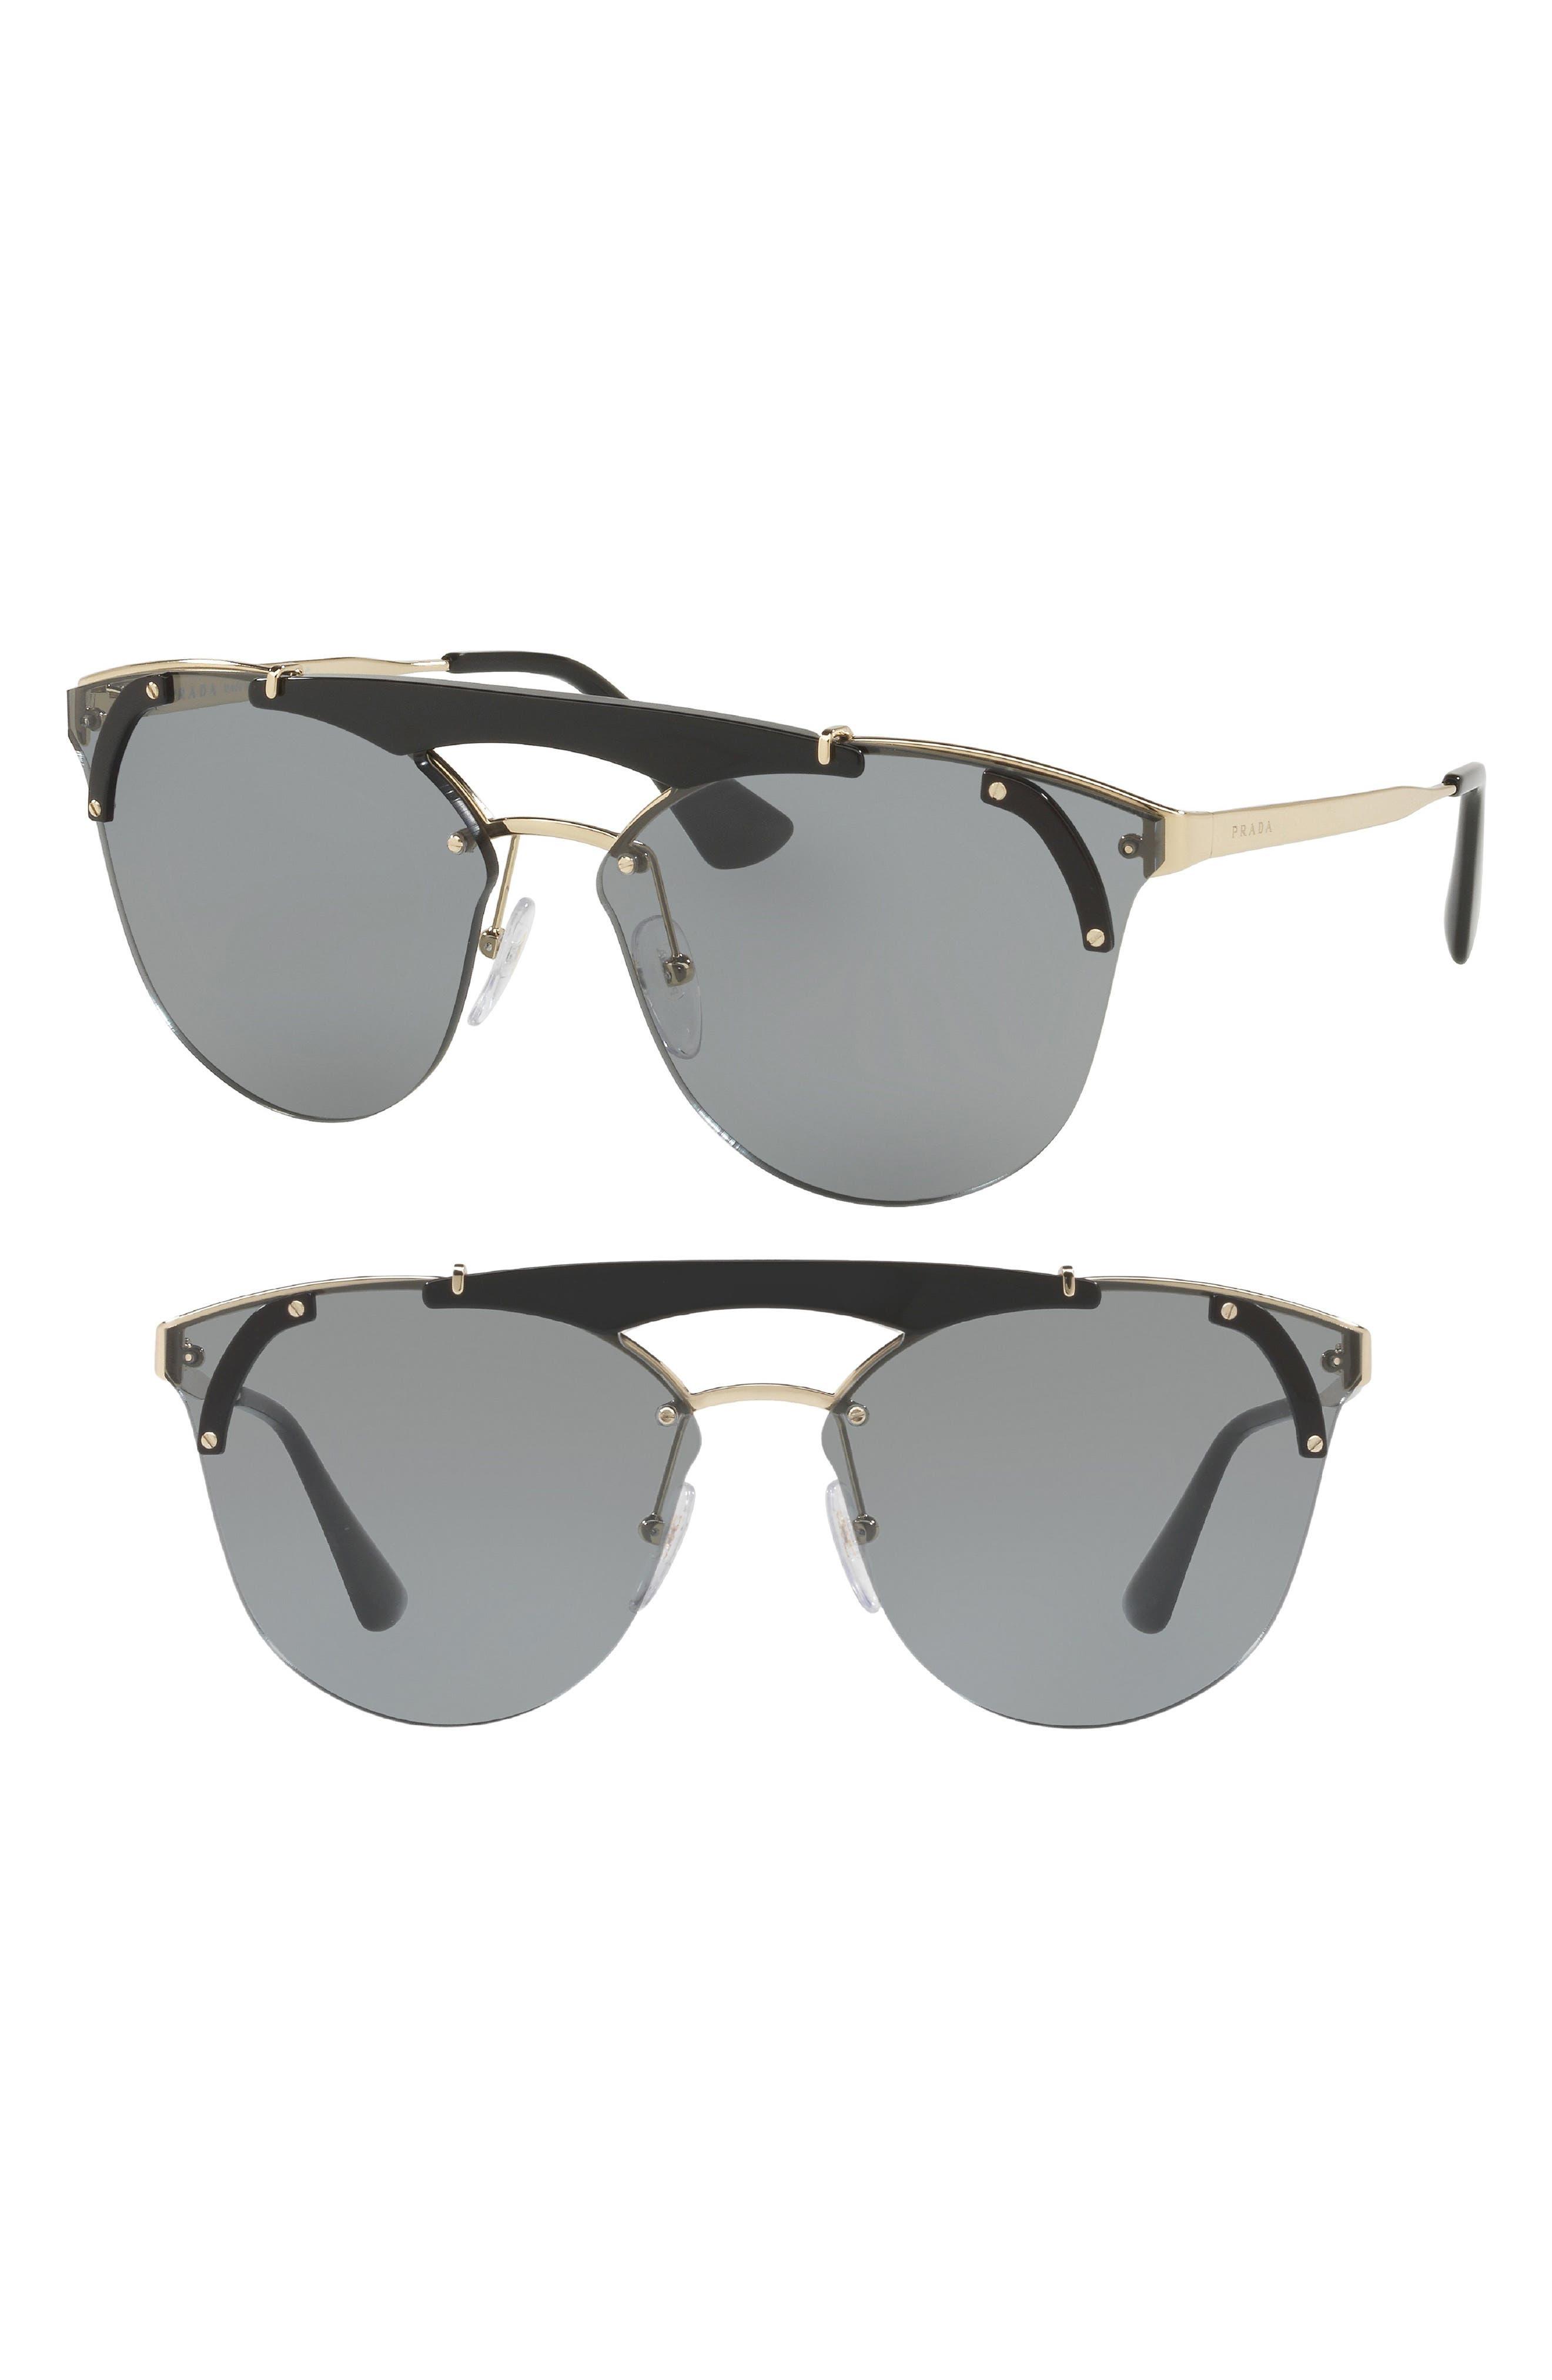 53mm Round Sunglasses,                             Alternate thumbnail 2, color,                             710